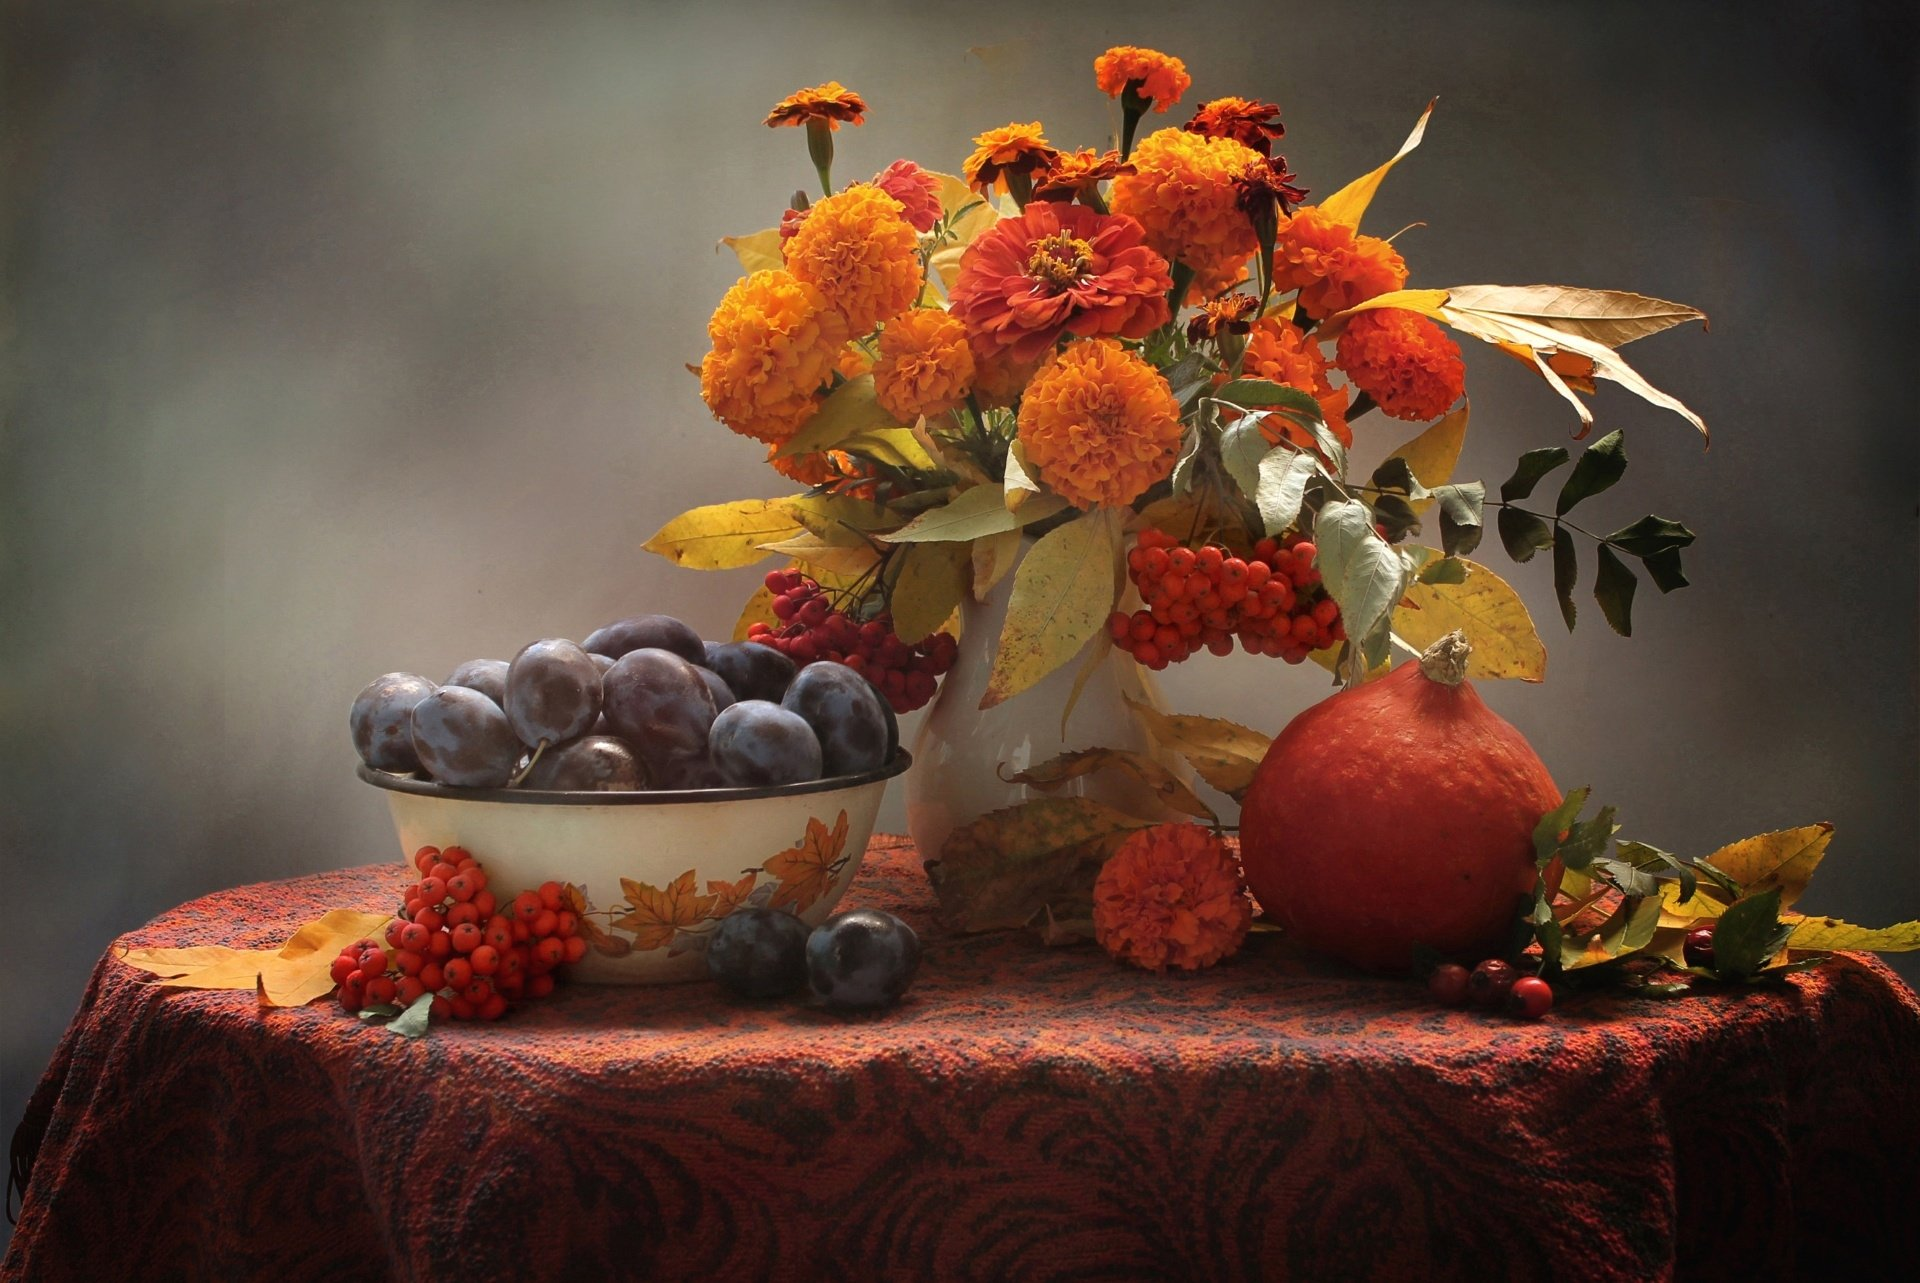 Fall Leaves Iphone 5 Wallpaper Nature Morte Fond D 233 Cran Hd Arri 232 Re Plan 1920x1283